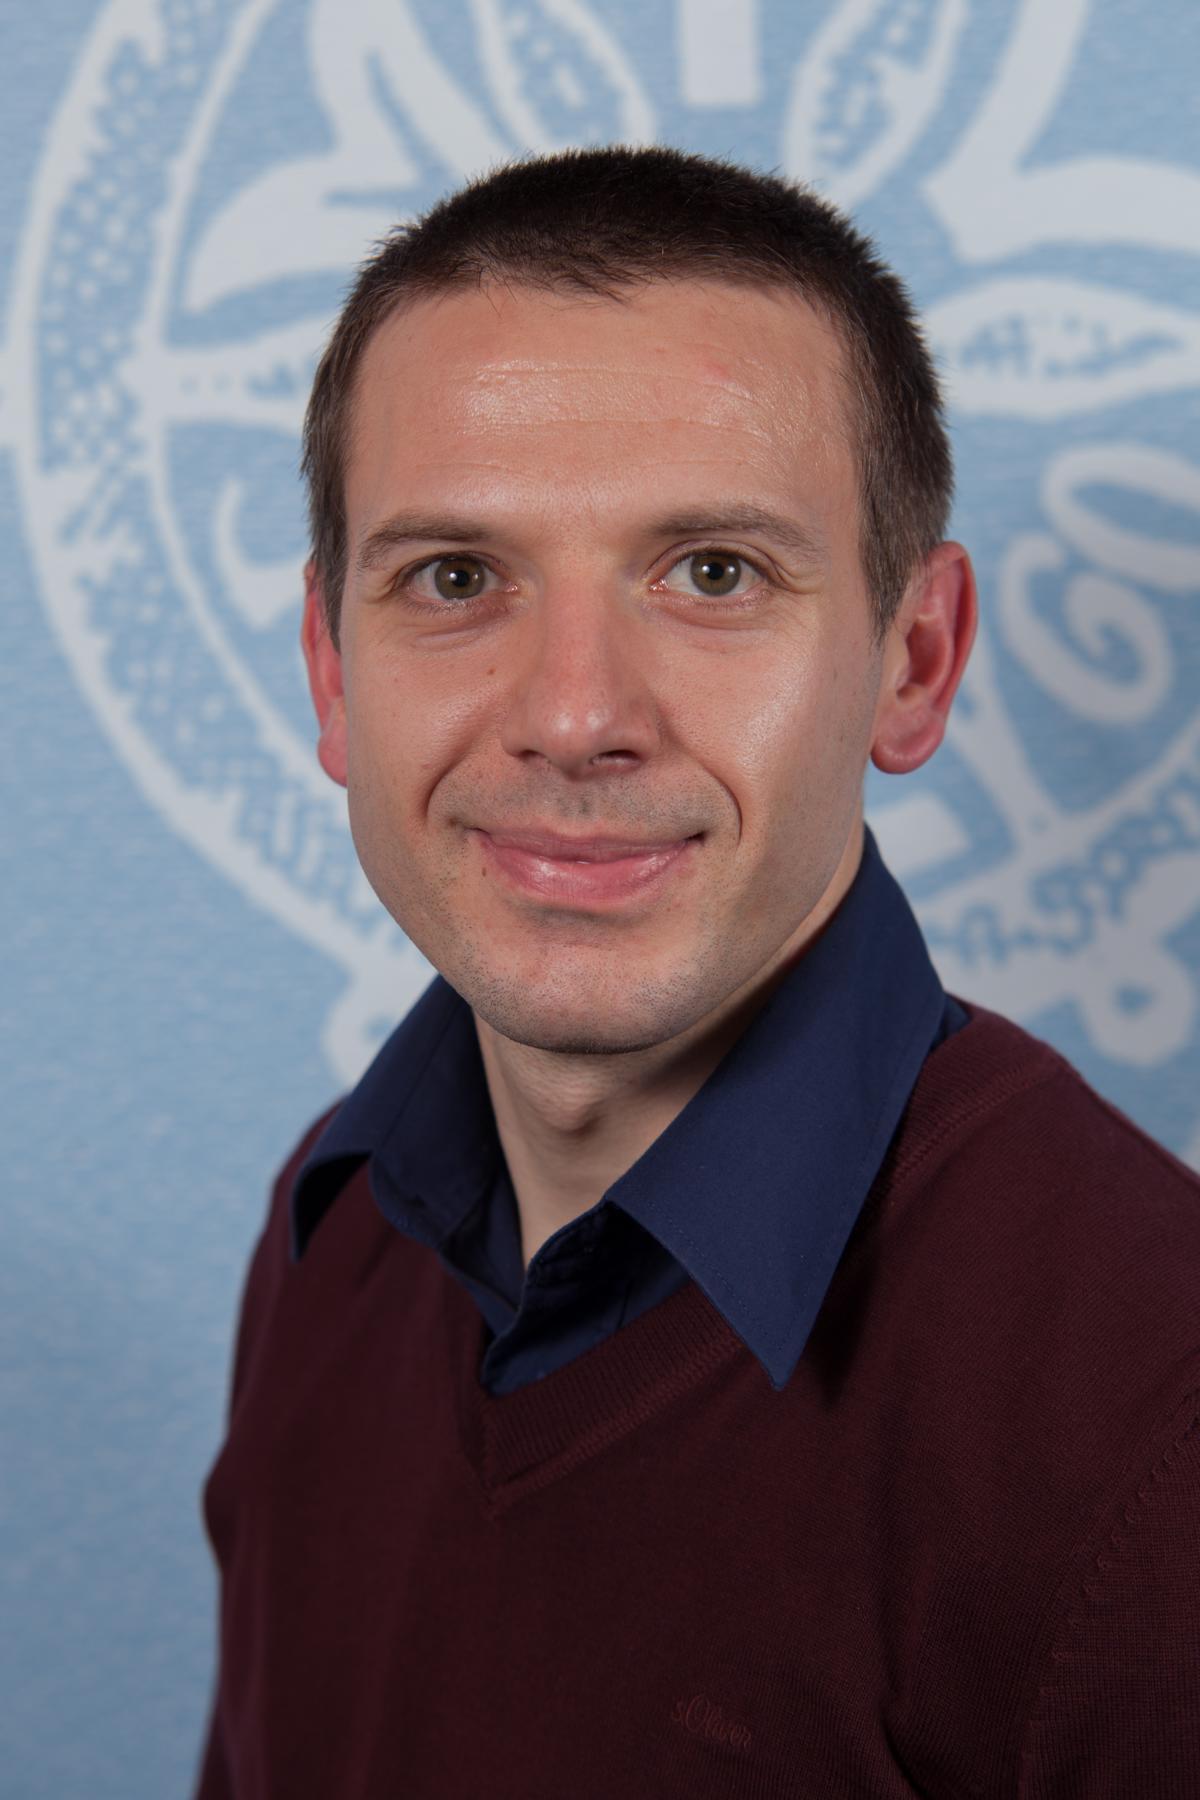 Markus Geidel